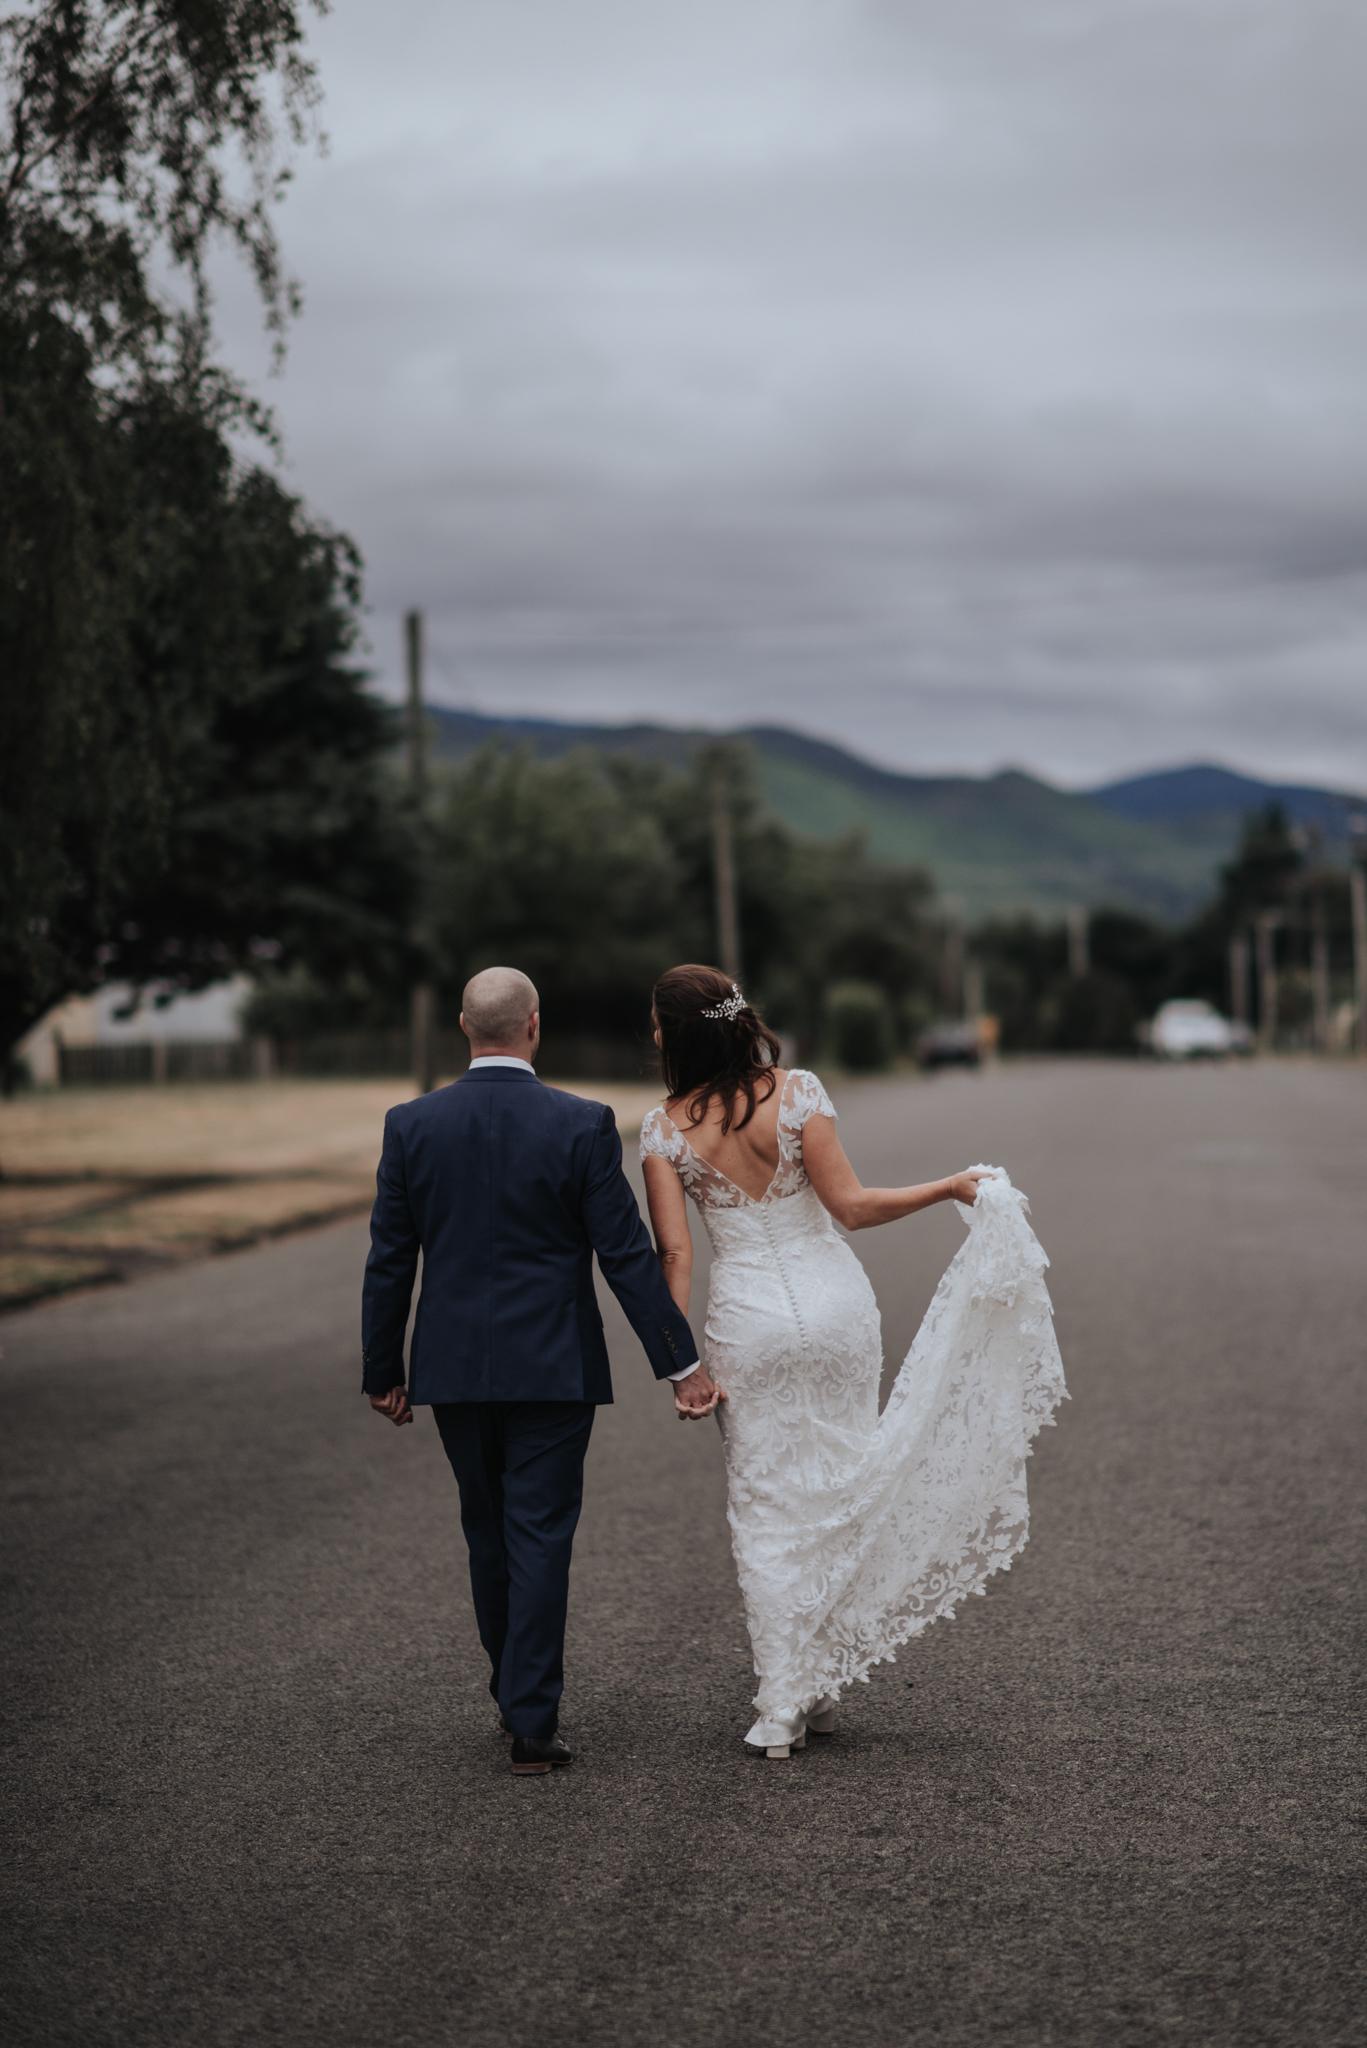 LOVELENSCAPES PHOTOGRAPHY • VISUAL POETRY • NEW ZEALAND WEDDING PHOTOGRAPHER • AUSTRALIAN WEDDING PHOTOGRAPHER • BRISBANE • MELBOURNE • SYDNEY • HOBART • TARUREKA ESTATE • ANNA CAMPBELL • 142.jpg